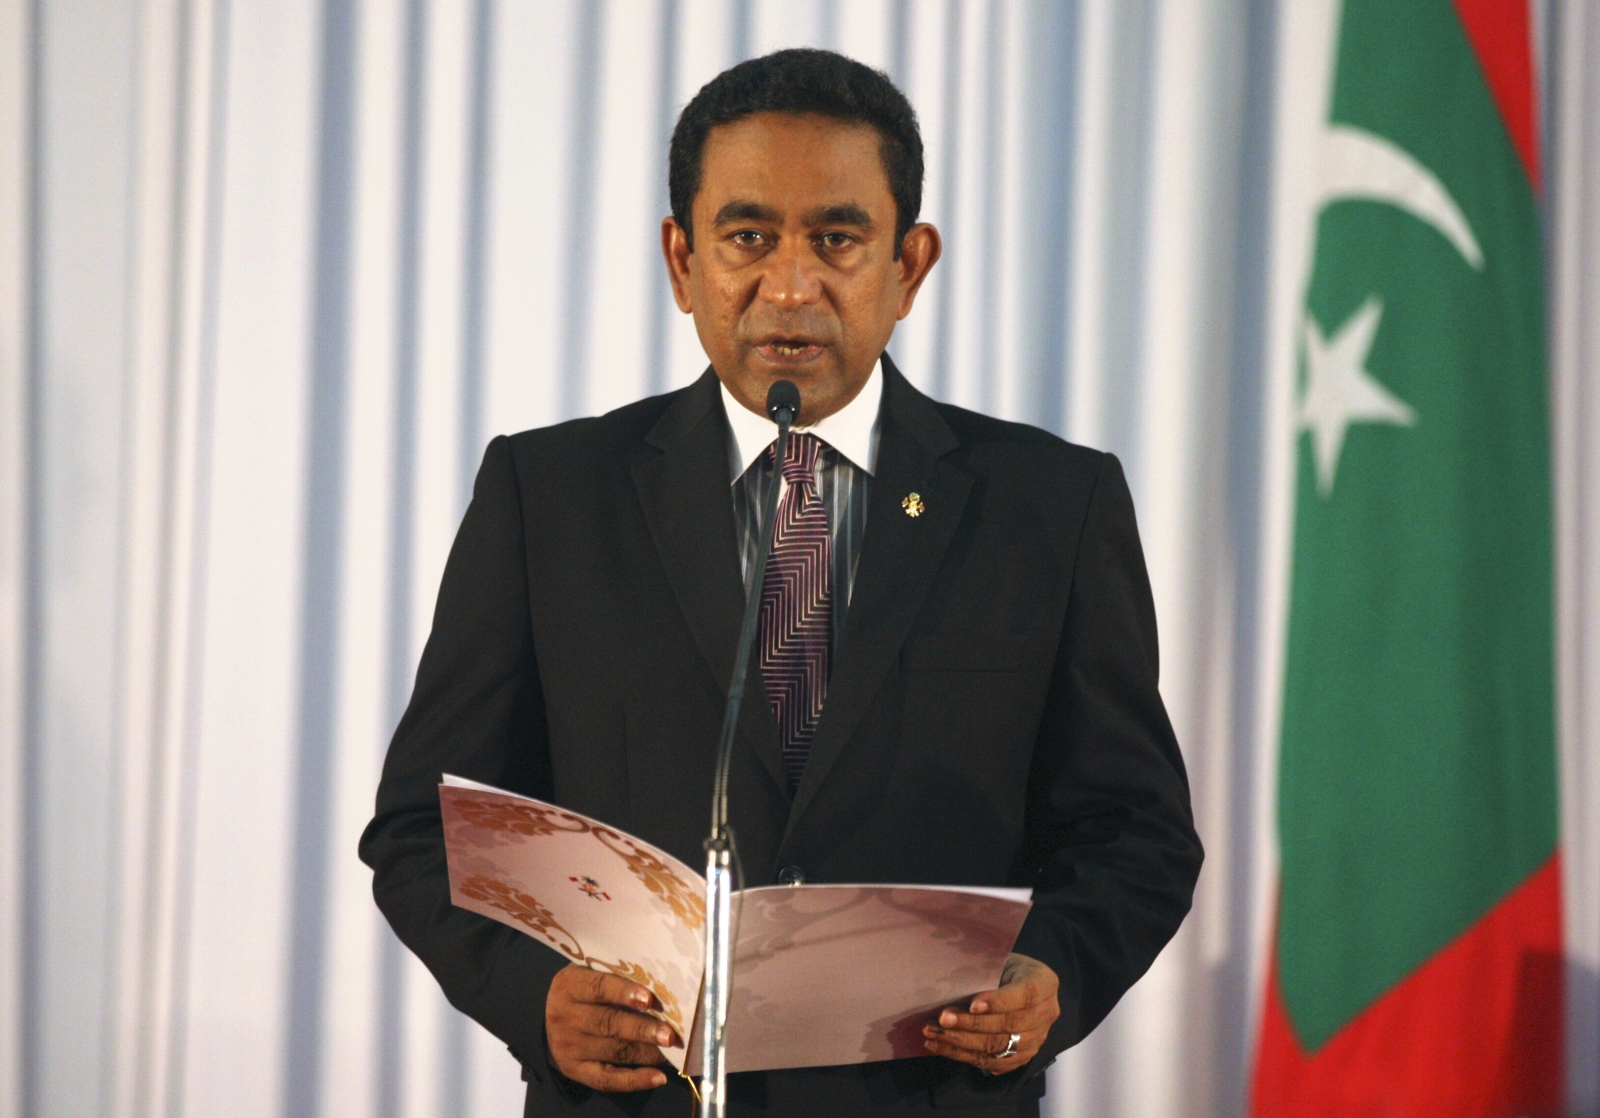 President Abdulla Yameen